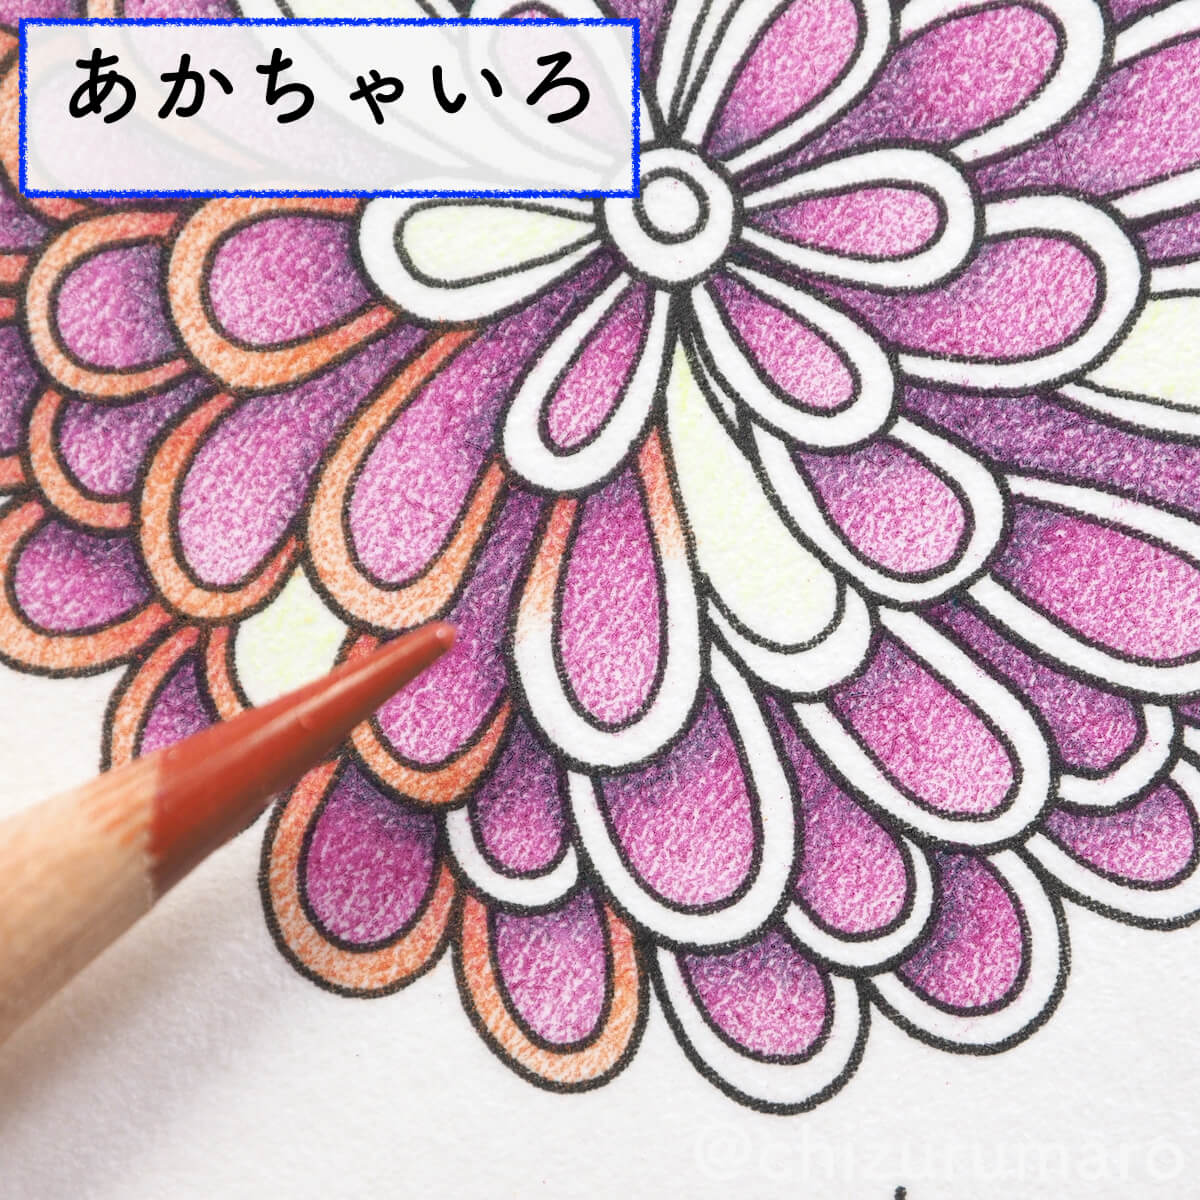 f:id:chizurumaro:20200422153028j:plain